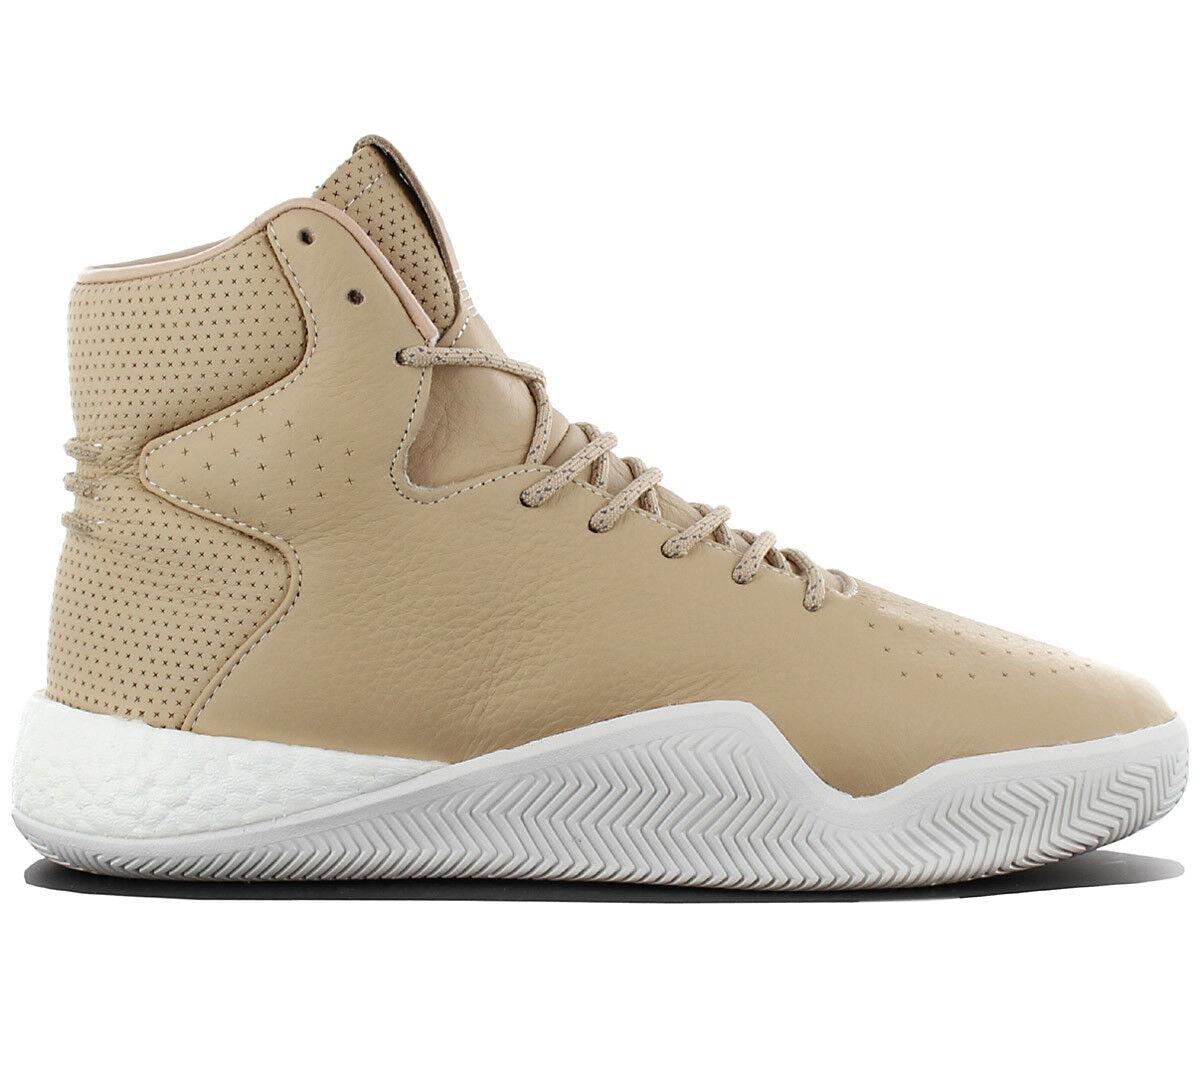 adidas originaux tubulaire hommes en en en cuir chaussures chaussures instinct stimuler beige 9152f4